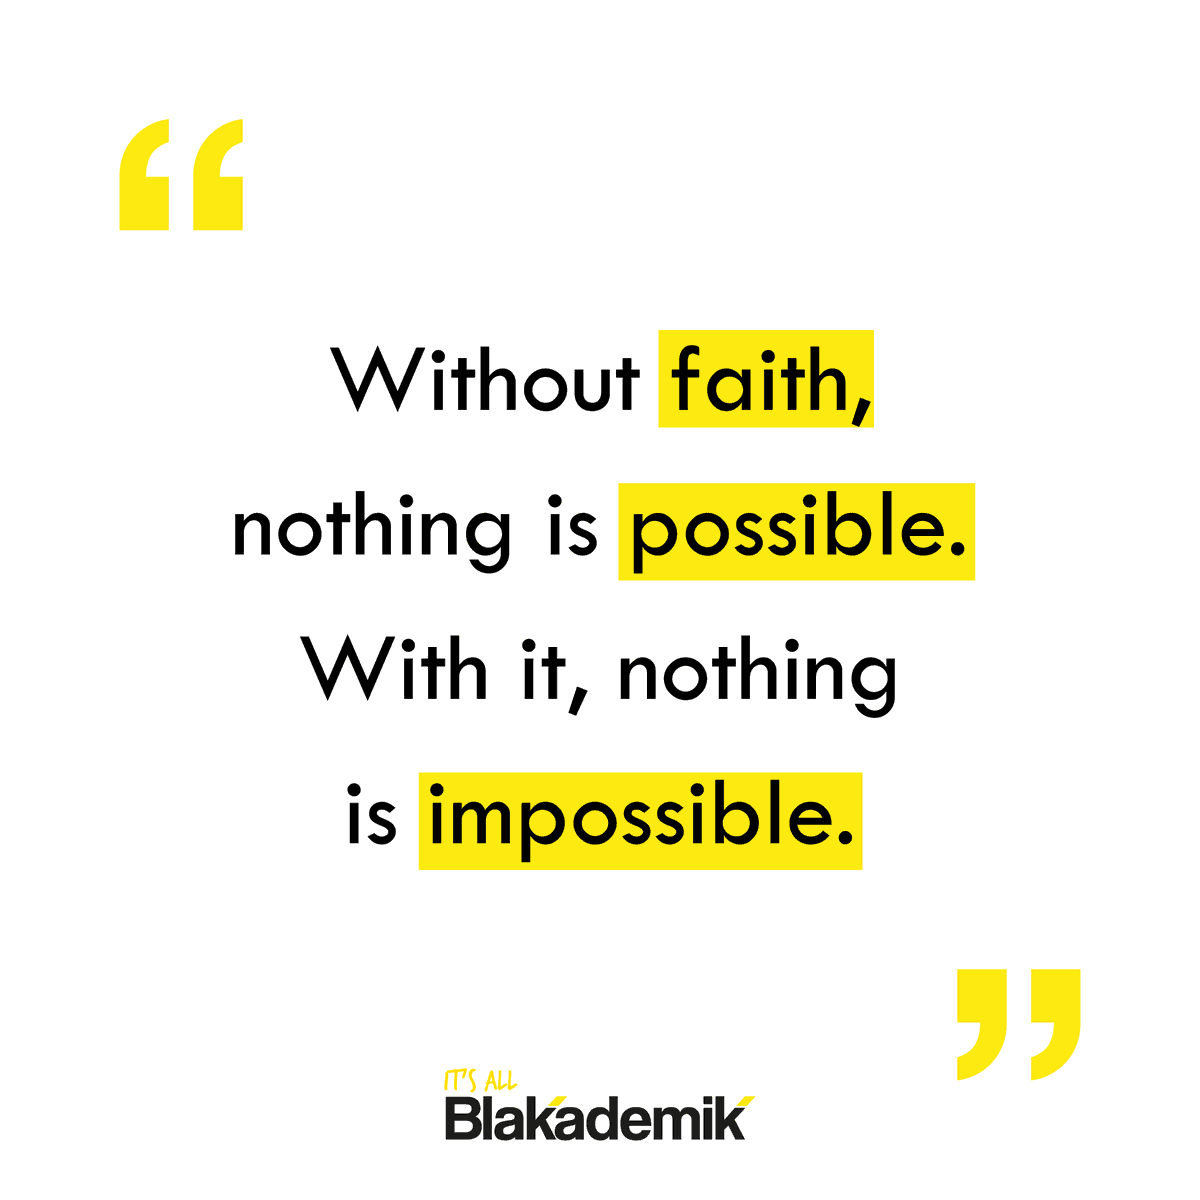 Faith in yourself. Faith in your team. Faith in the process. (Quote by Mary McLeod Bethune)  #MondayMotivation #MondayMorning #MotivationMonday #MotivationalQuotes #RoadToSuccess #MaryMcLeodBethune #BlackExcellence #SuccessMinded #KeyToSuccess #EmpowerTheCulture #Blakademikpic.twitter.com/YsZCxQruzV